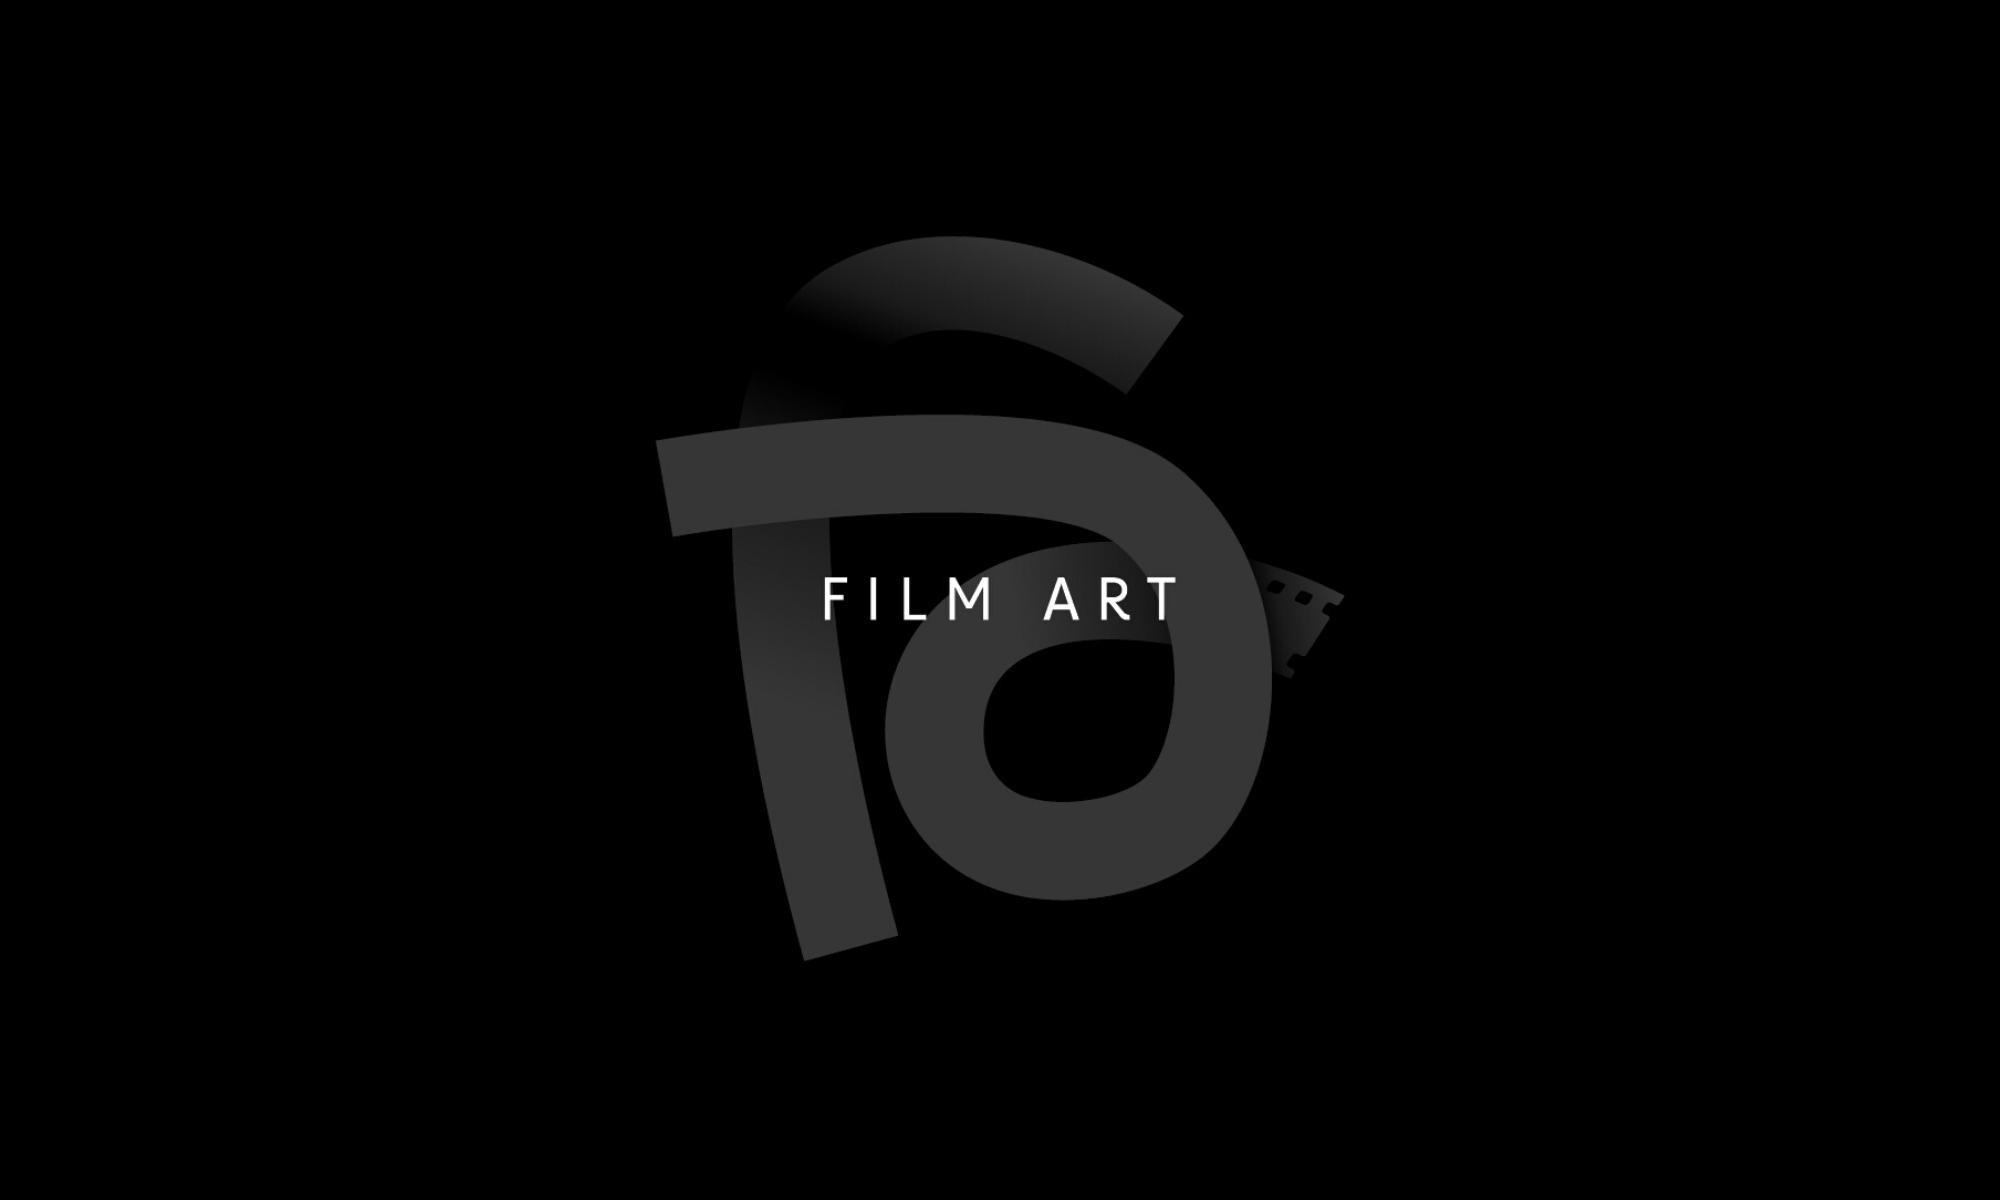 Film Art Maciej Szwarc